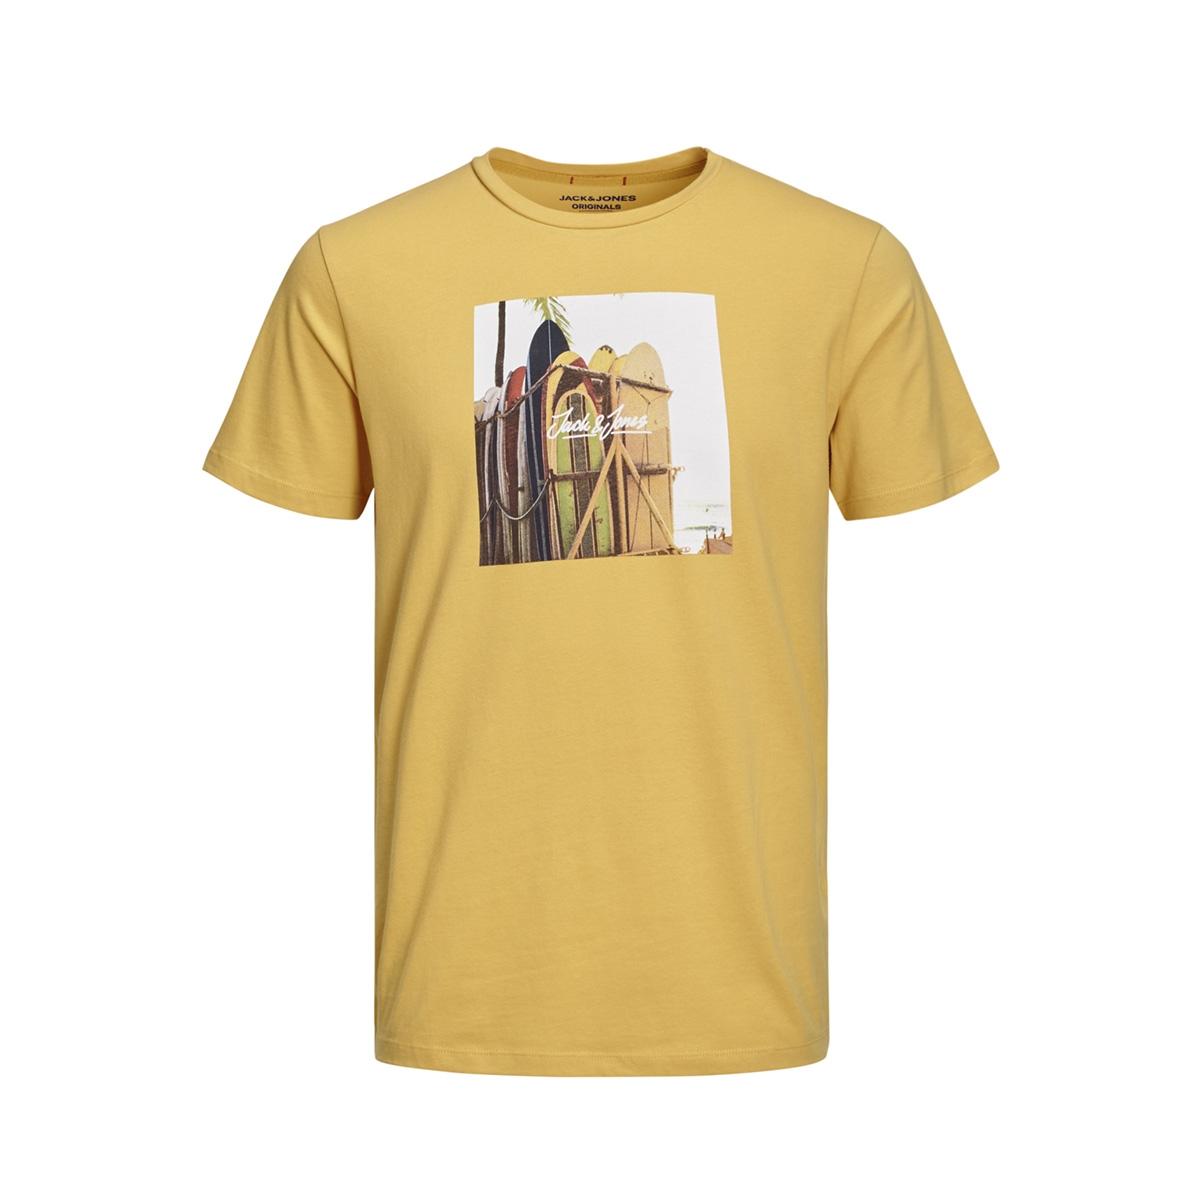 jorhotel tee ss crew neck 12152660 jack & jones t-shirt yolk yellow